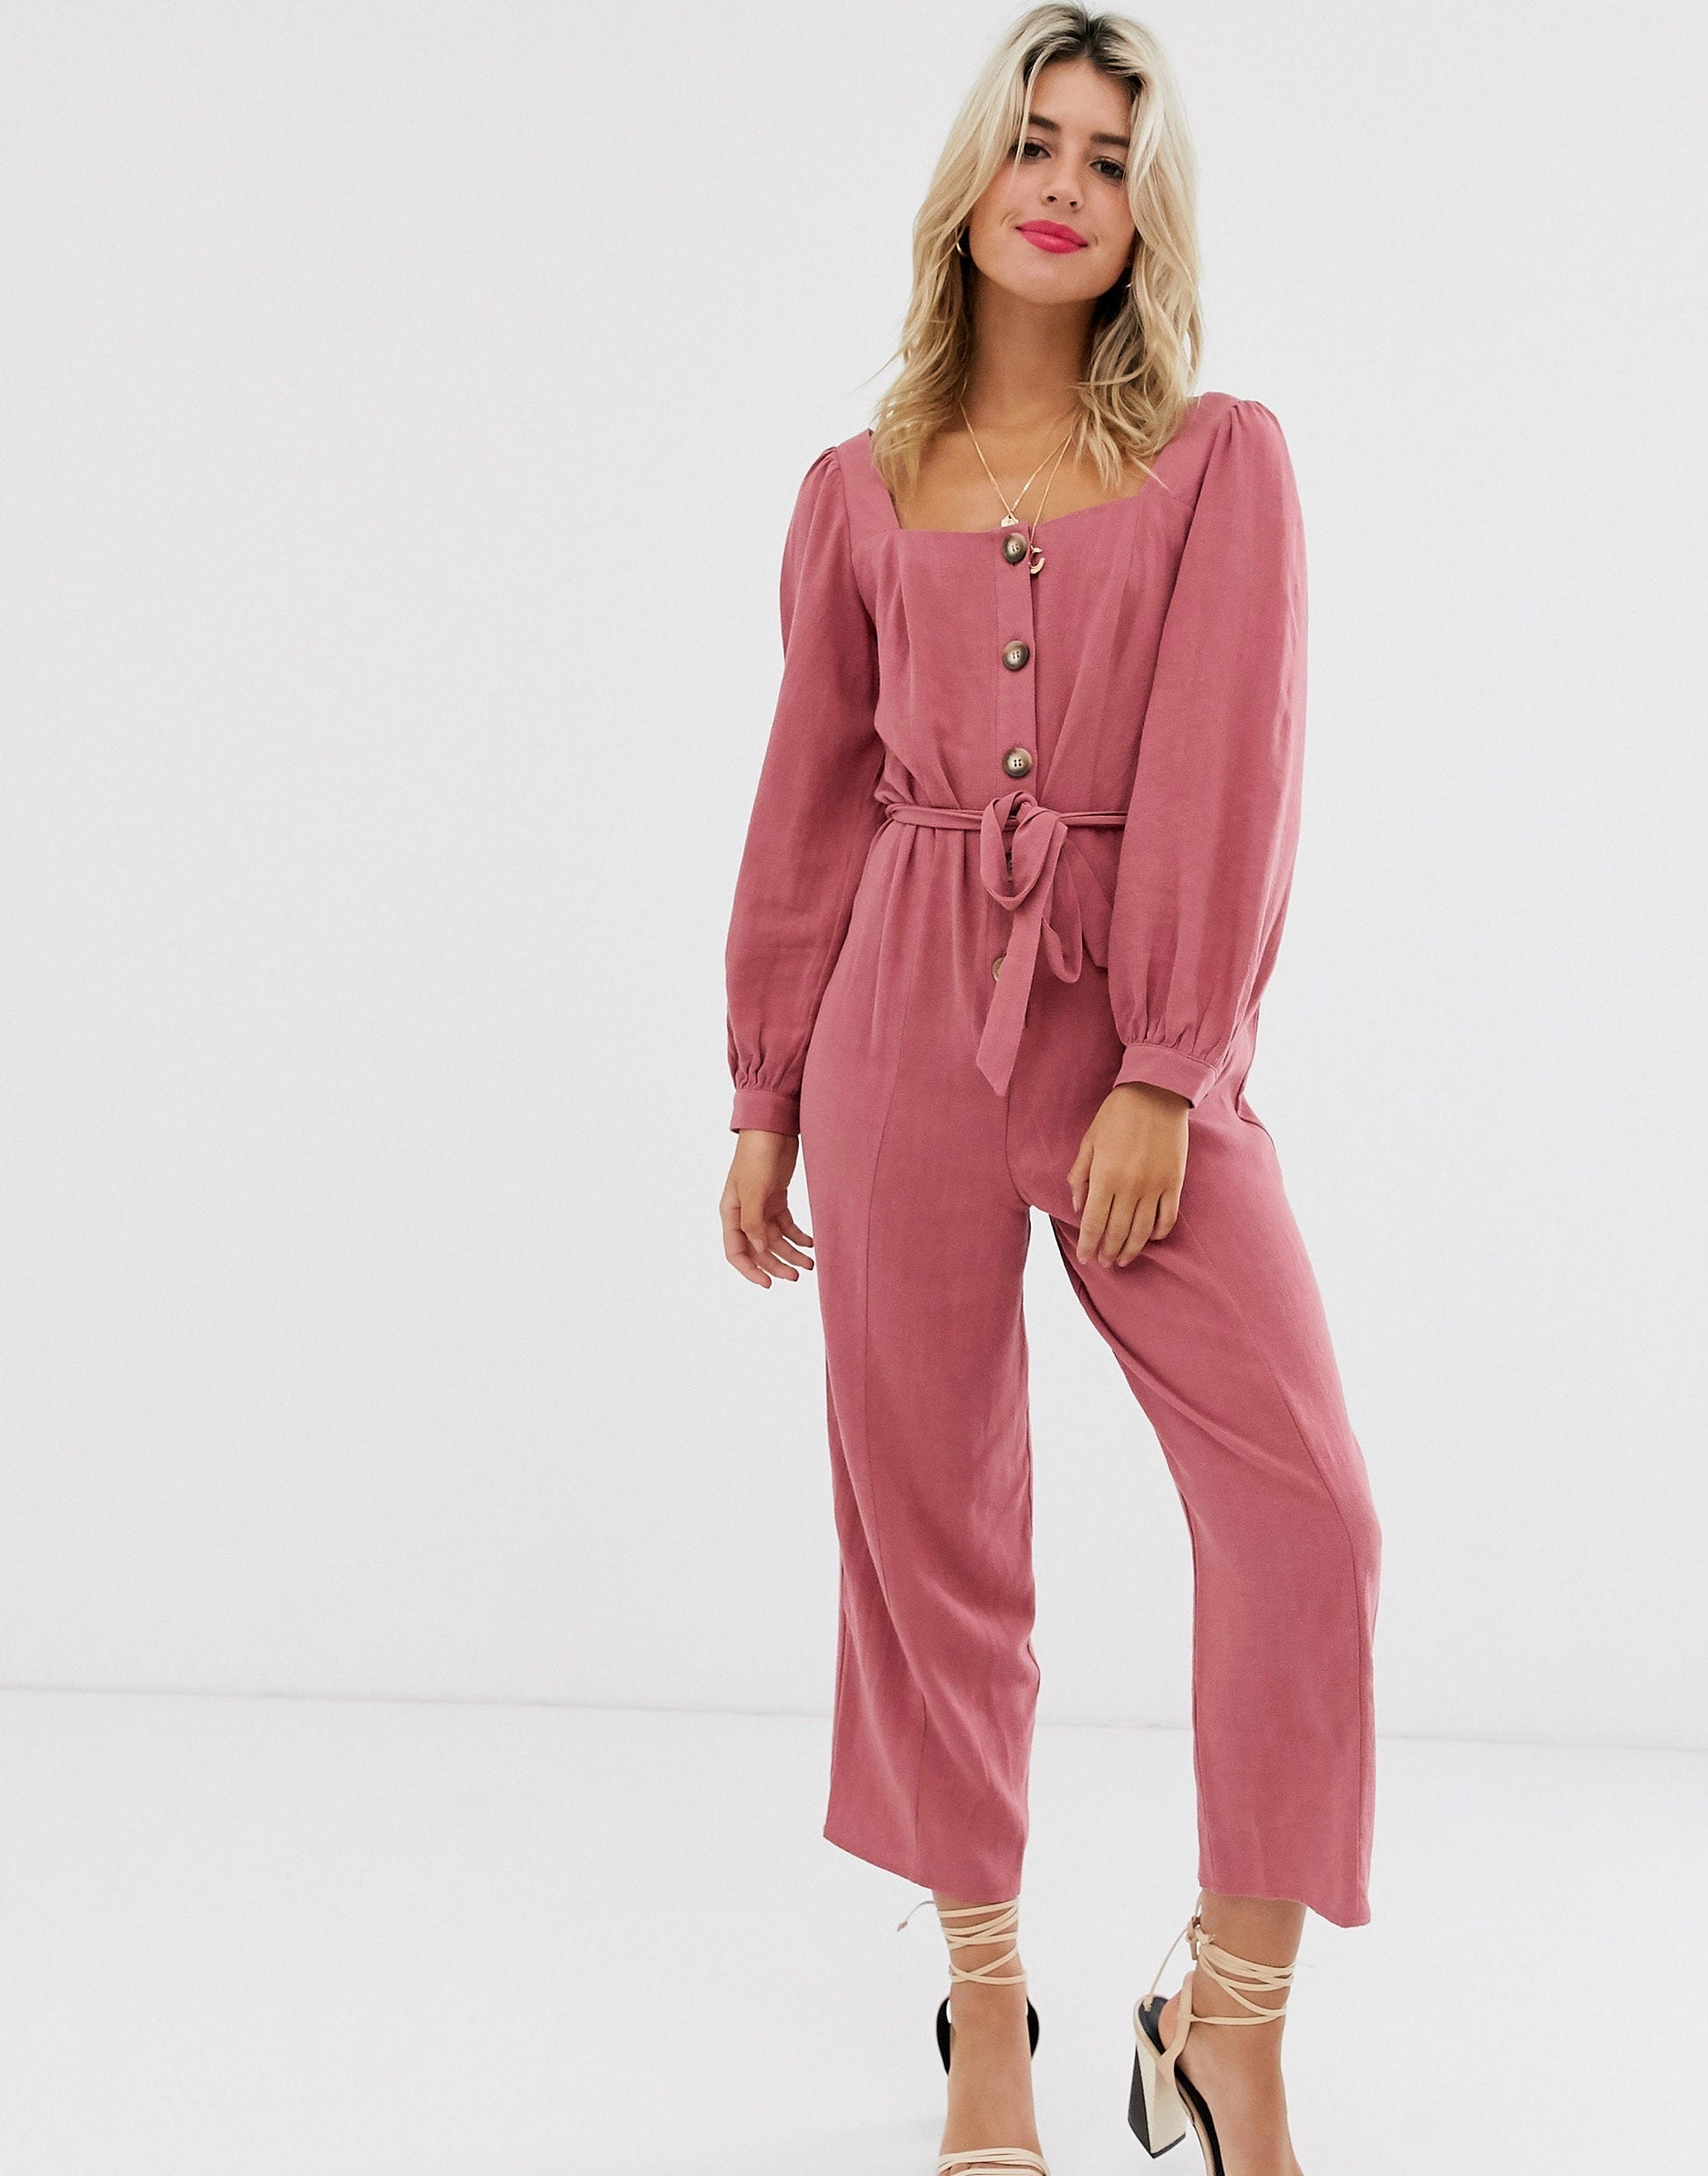 53689ff13 Popular Fashion Items On ASOS, Best Selling Summer 2019